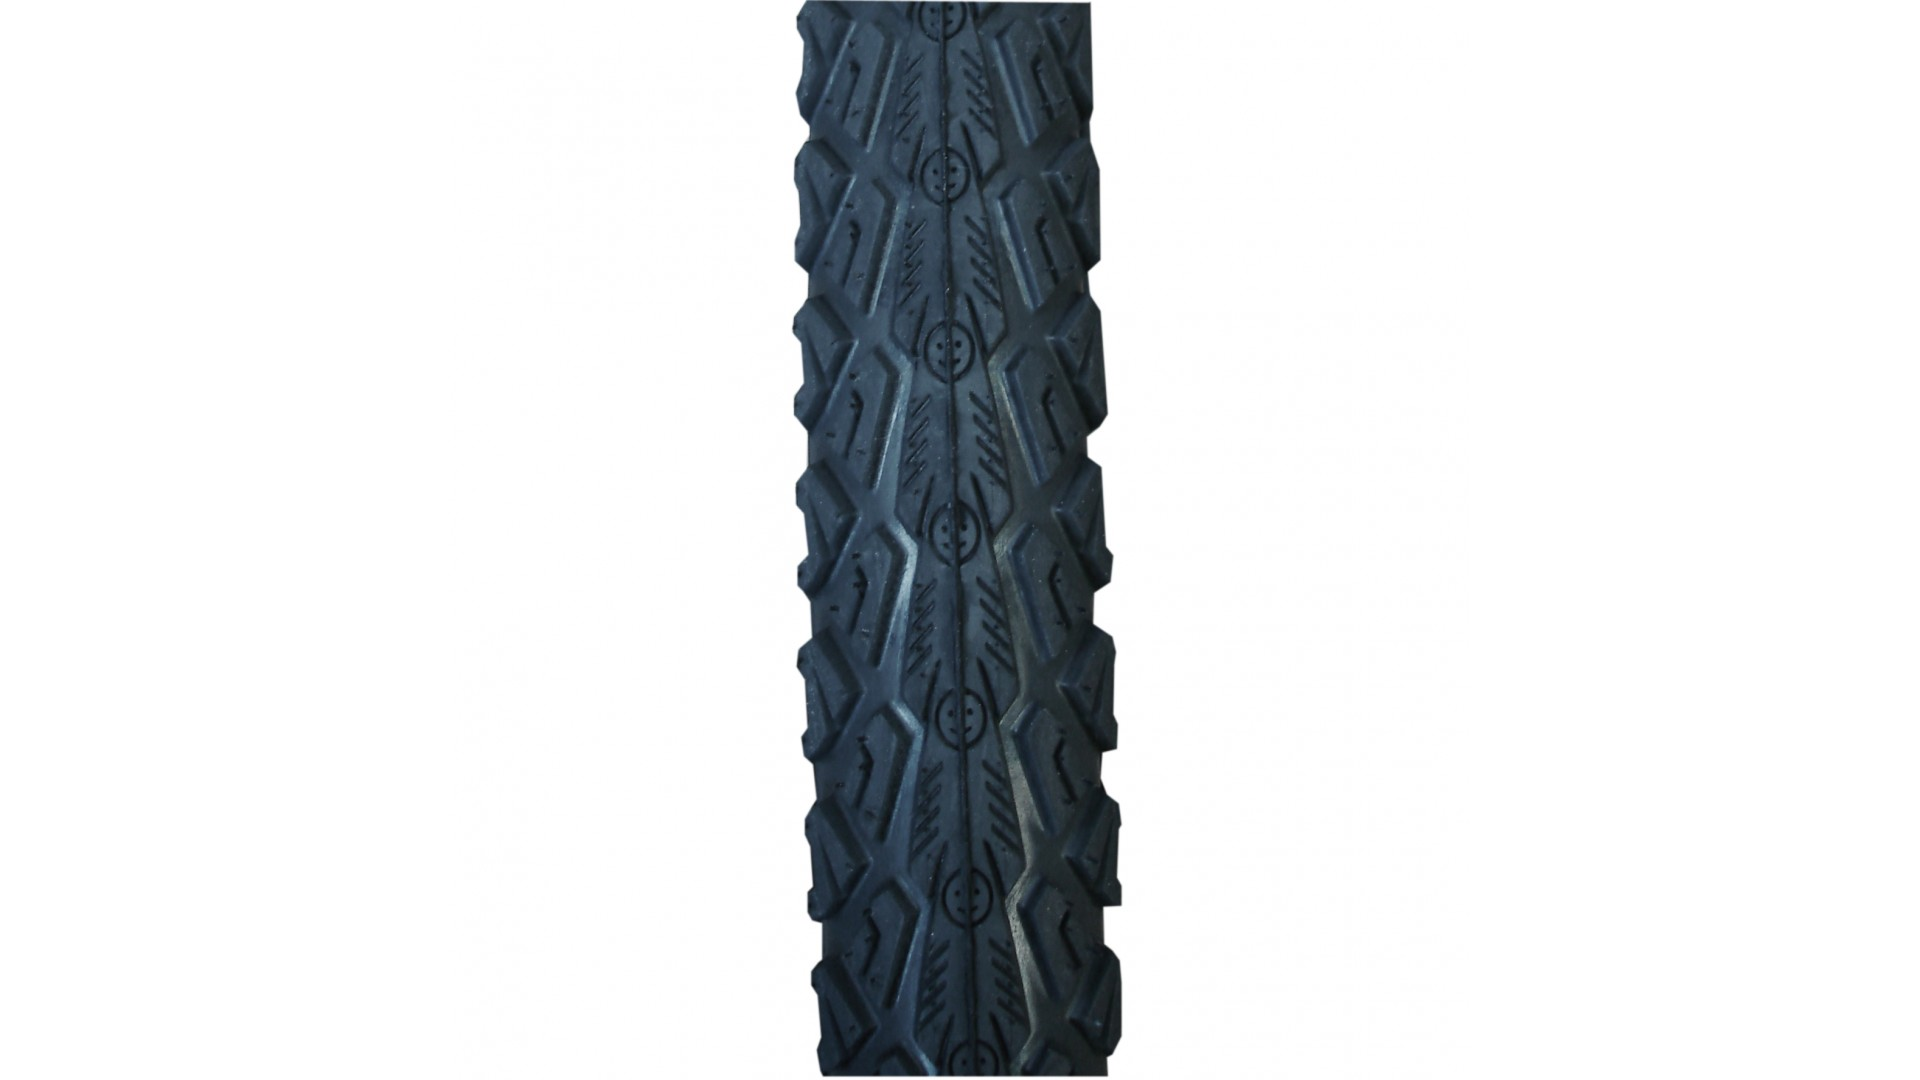 Покрышка RUBENA 24 x 1.75-2 (47x507) SHIELD V81 Classic Clever Face черная